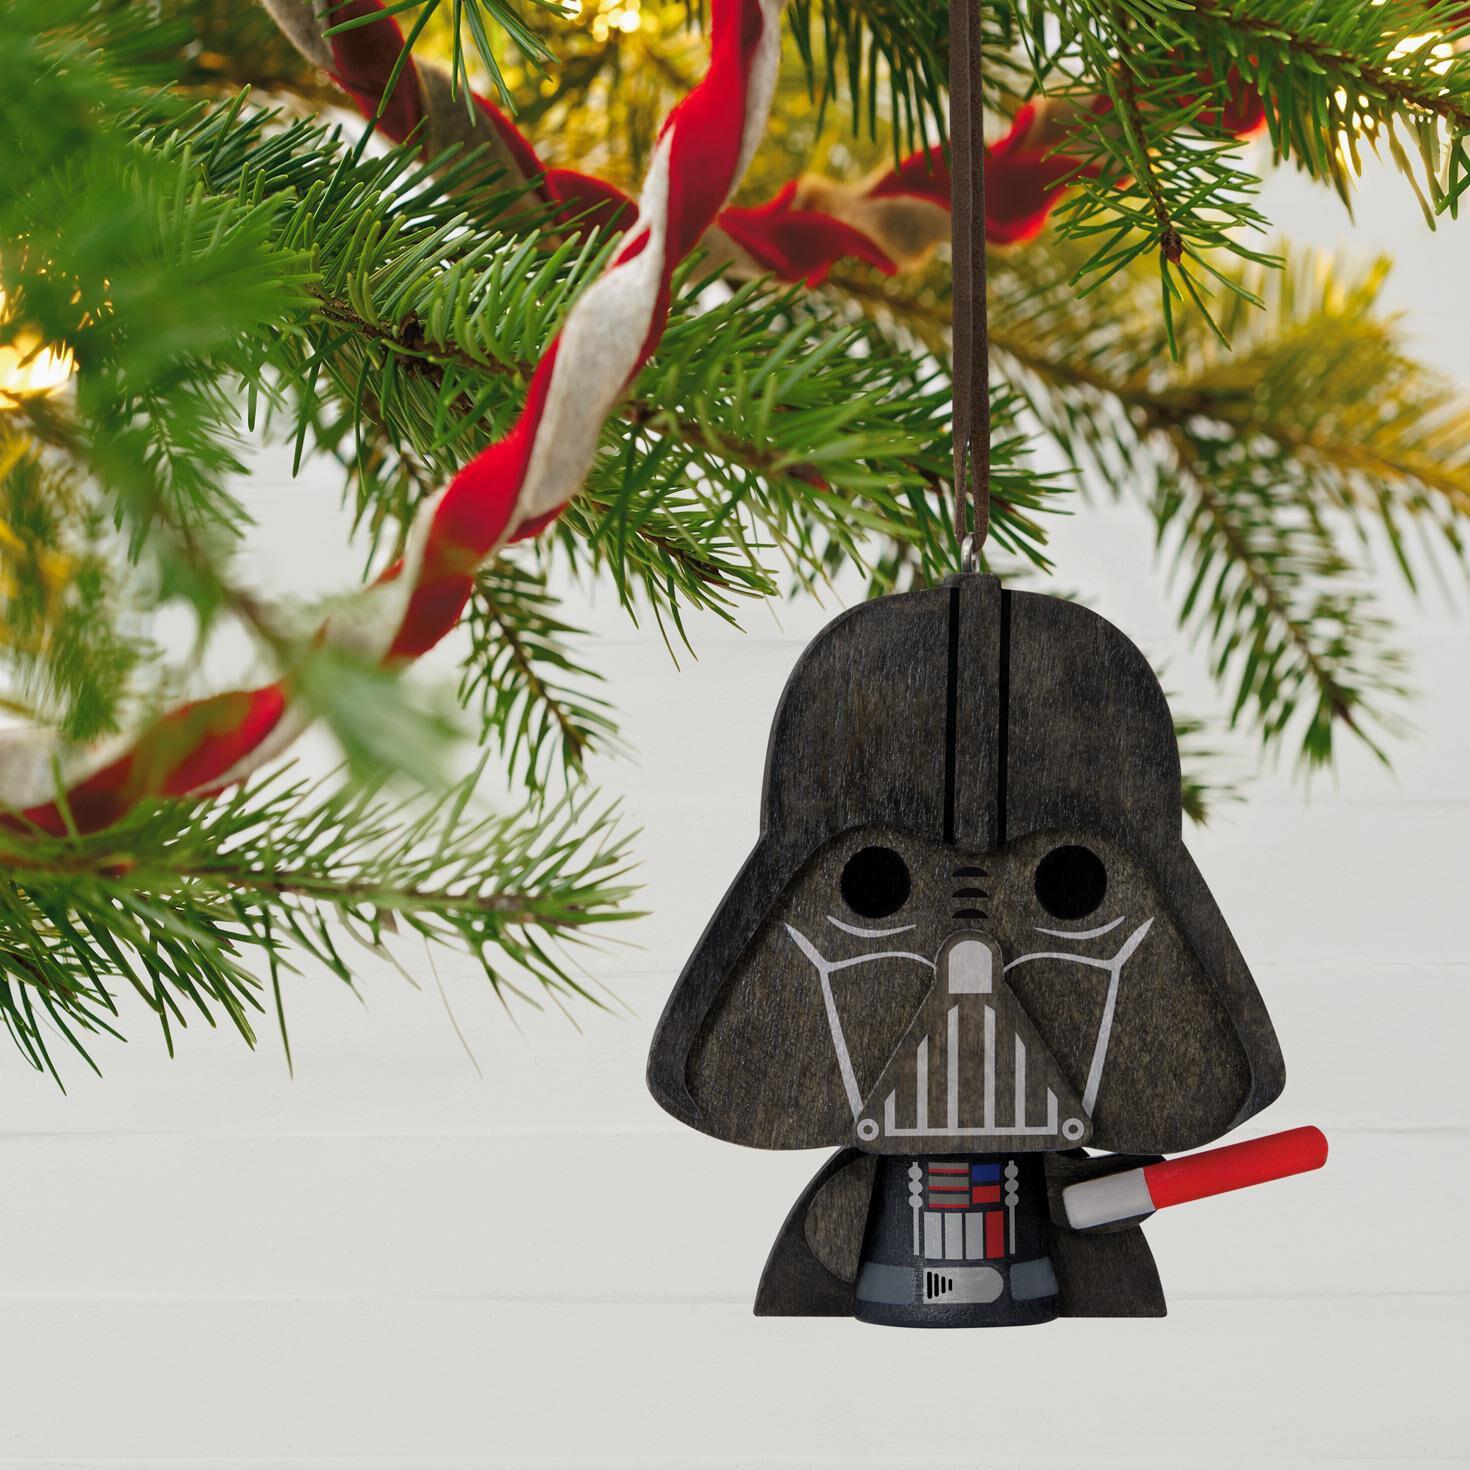 Star Wars™ Darth Vader™ Wood Ornament - Keepsake Ornaments - Hallmark